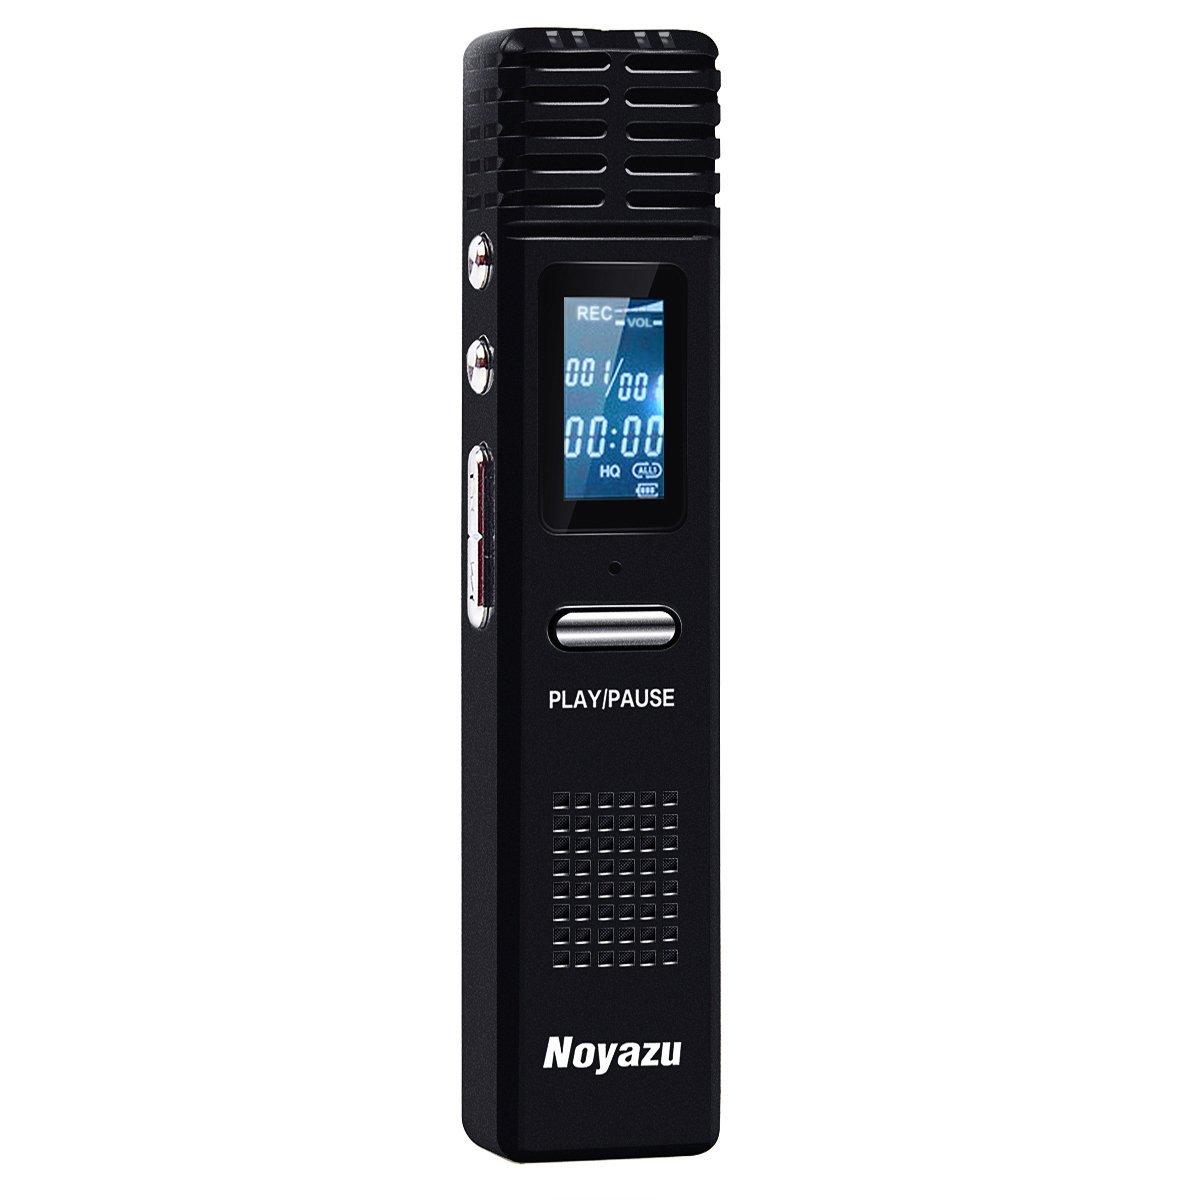 Noyazu X1 HD 8G Digital Voice Recorder Microphone Mp3 Player Flash Drive (Black)